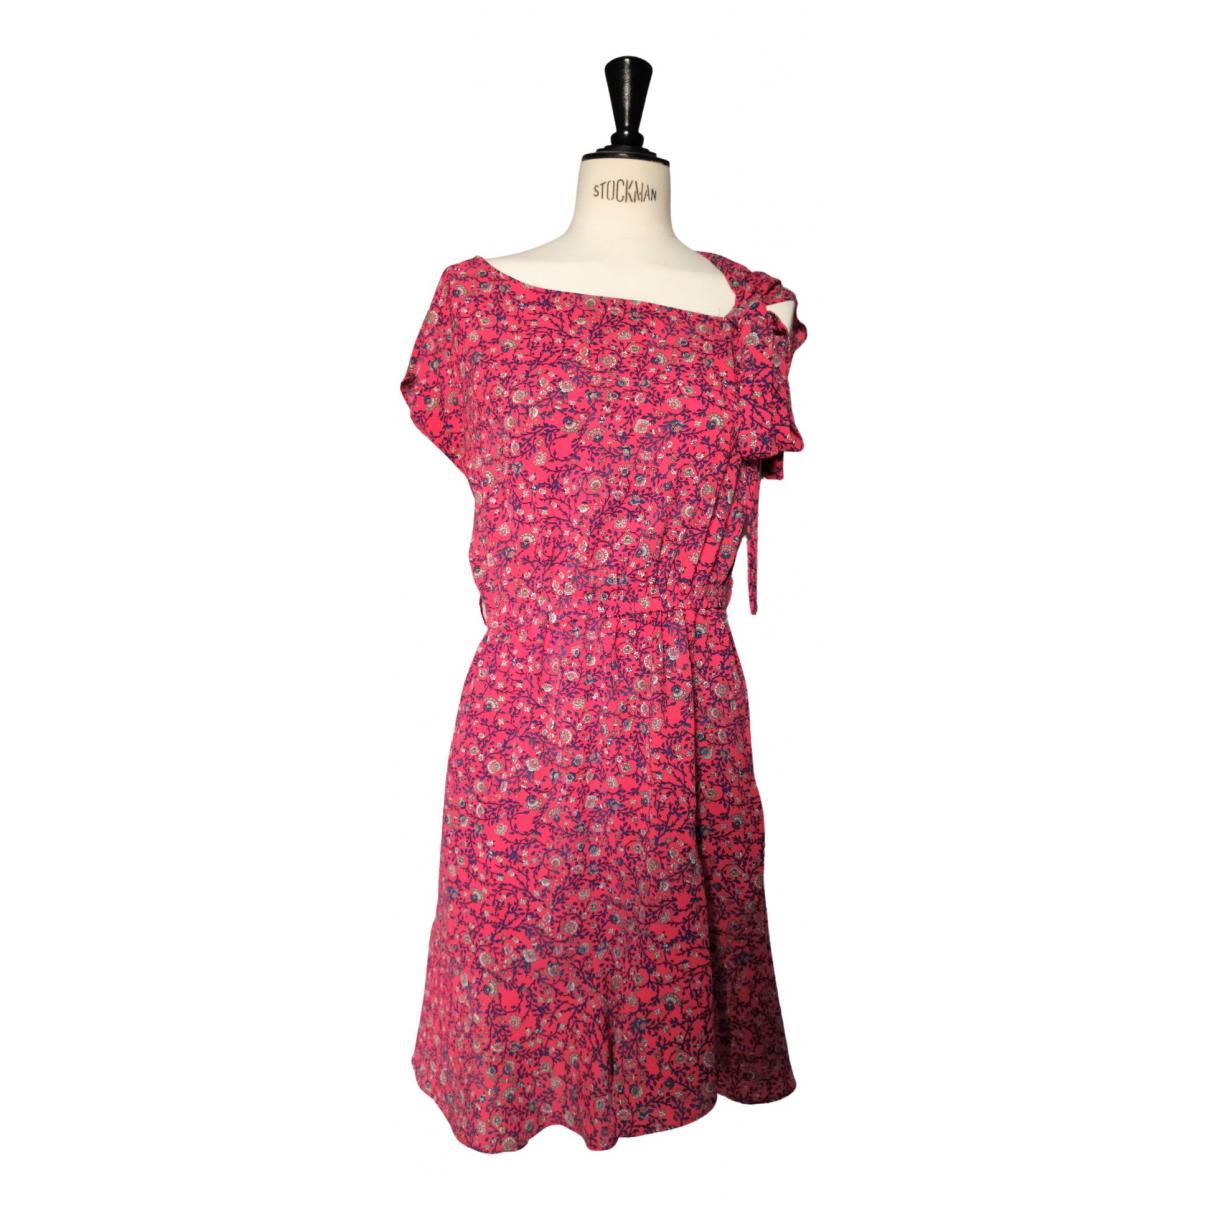 Ikks - Robe   pour femme - multicolore